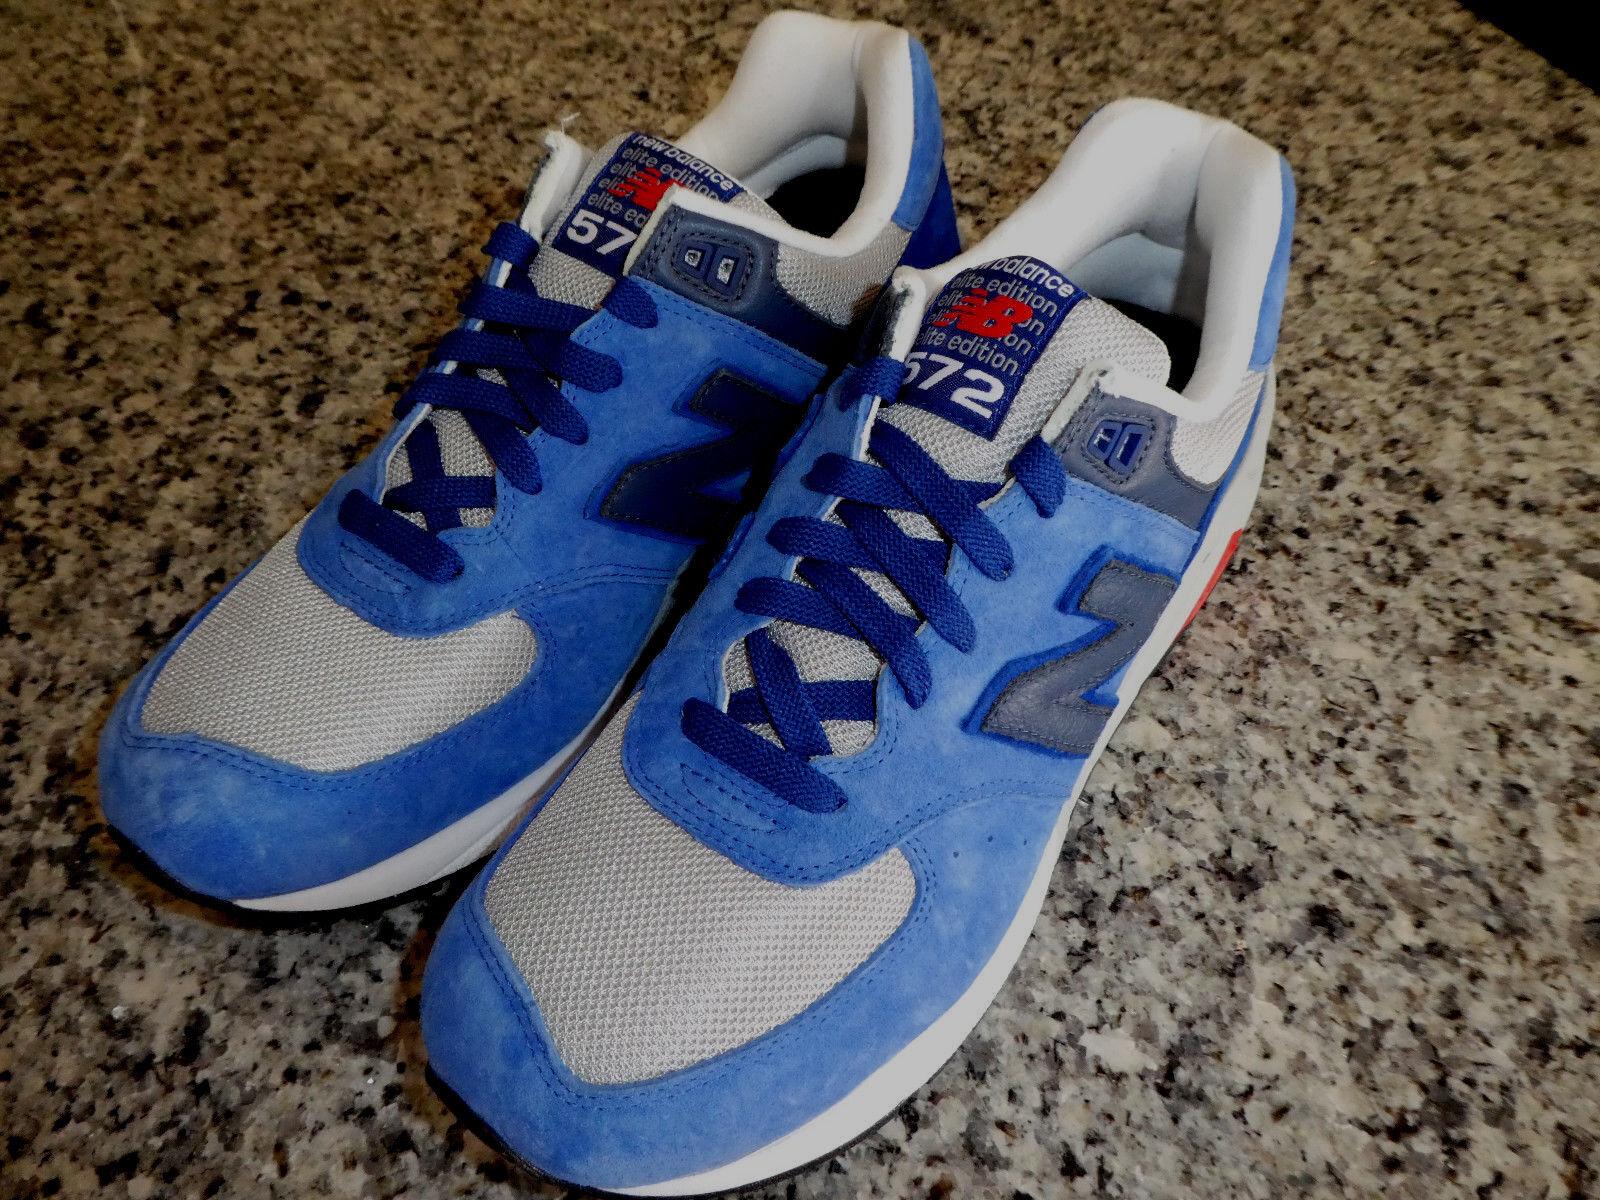 Mens New Balance 575 shoes Size 9.5 MRT572BG sneakers